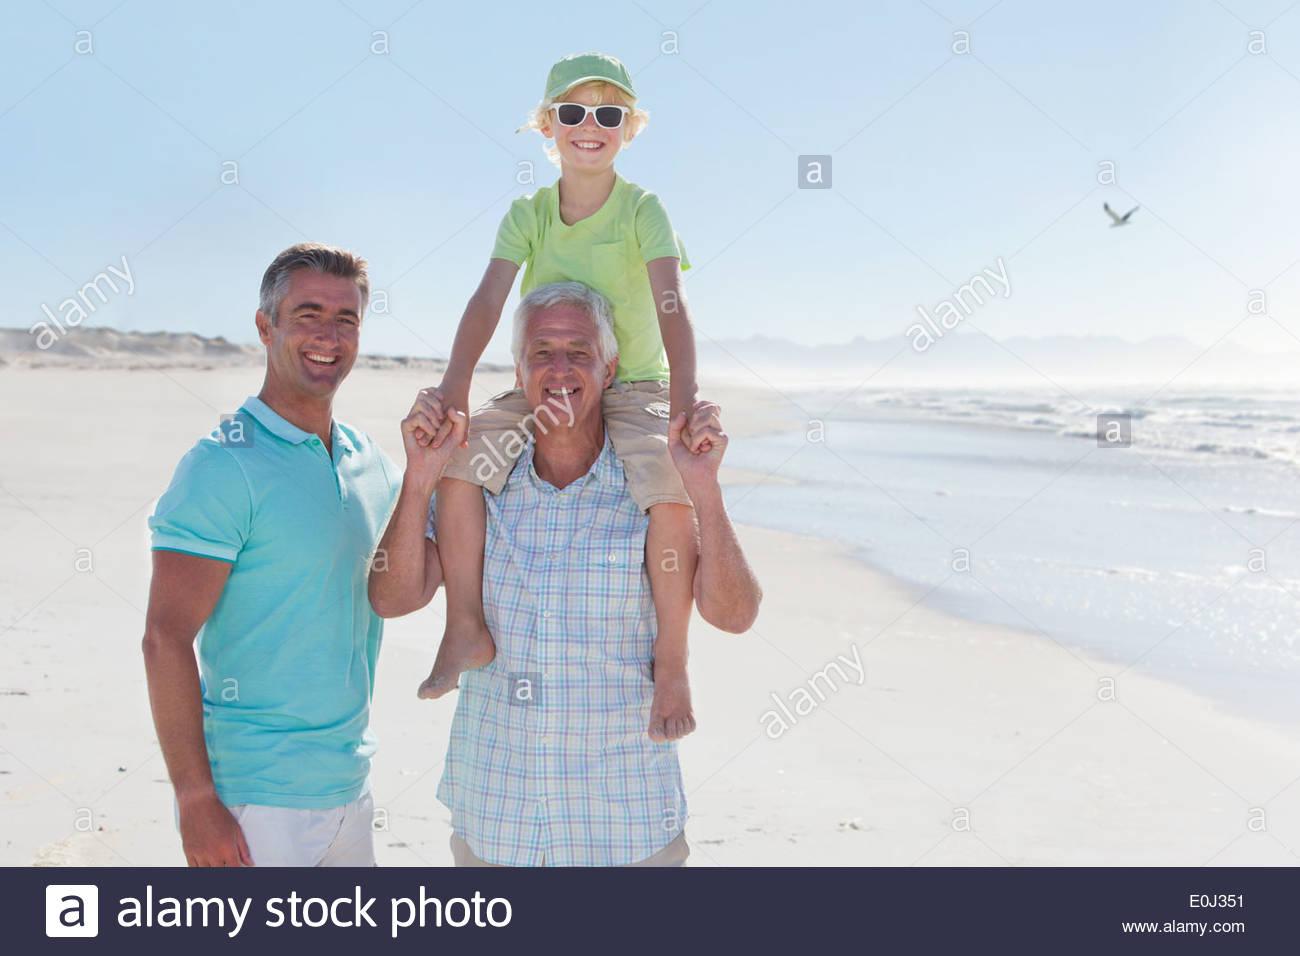 Multi-generation men on sunny beach - Stock Image